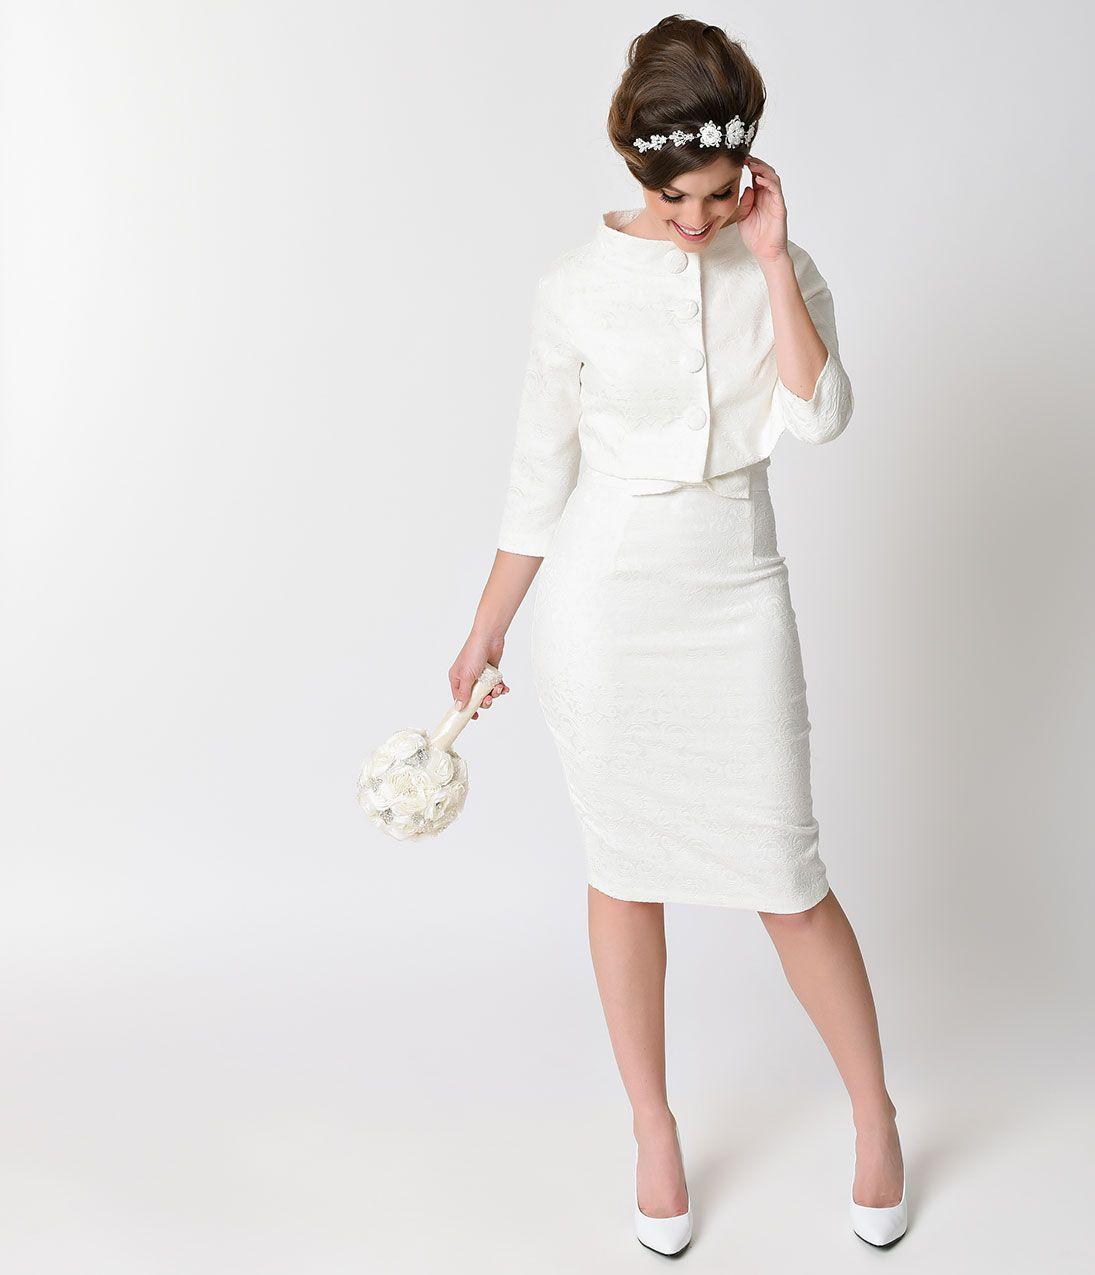 50s Wedding Dress, 1950s Style Wedding Dresses, Rockabilly Weddings ...